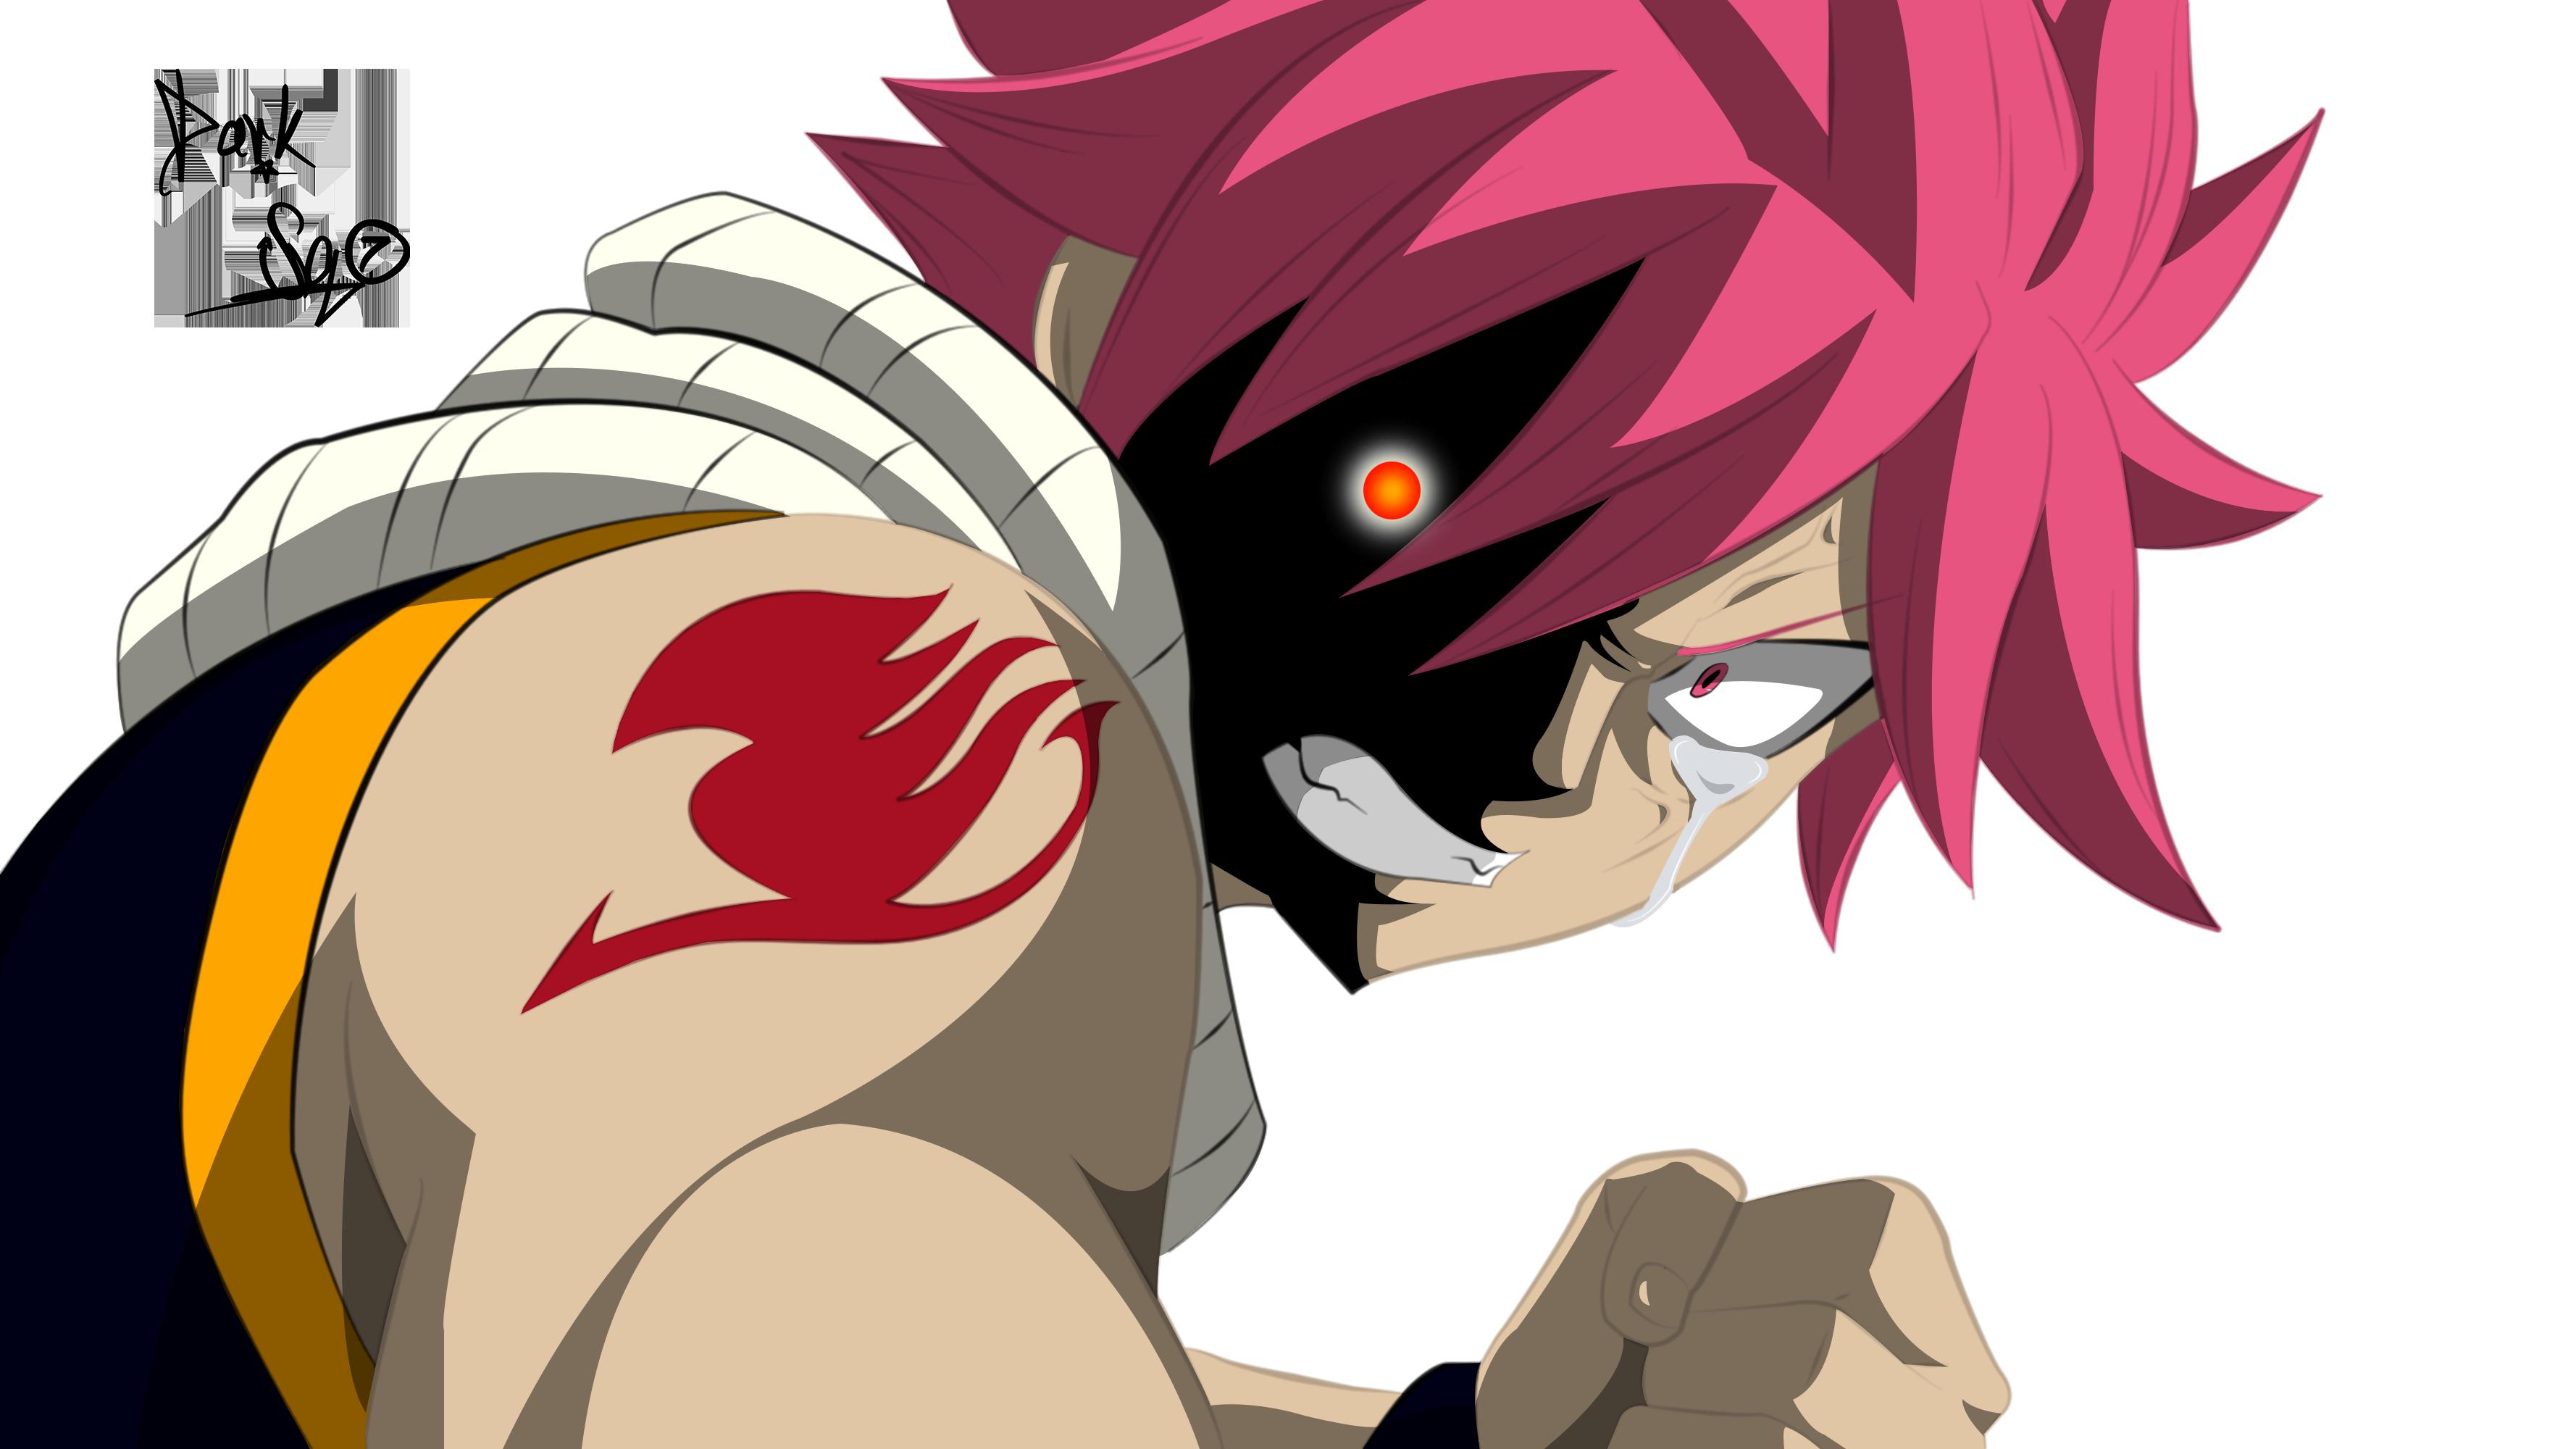 Natsu Dragneel angry-Fairy Tail ch.495 by parokas on ...  Natsu Dragneel Angry